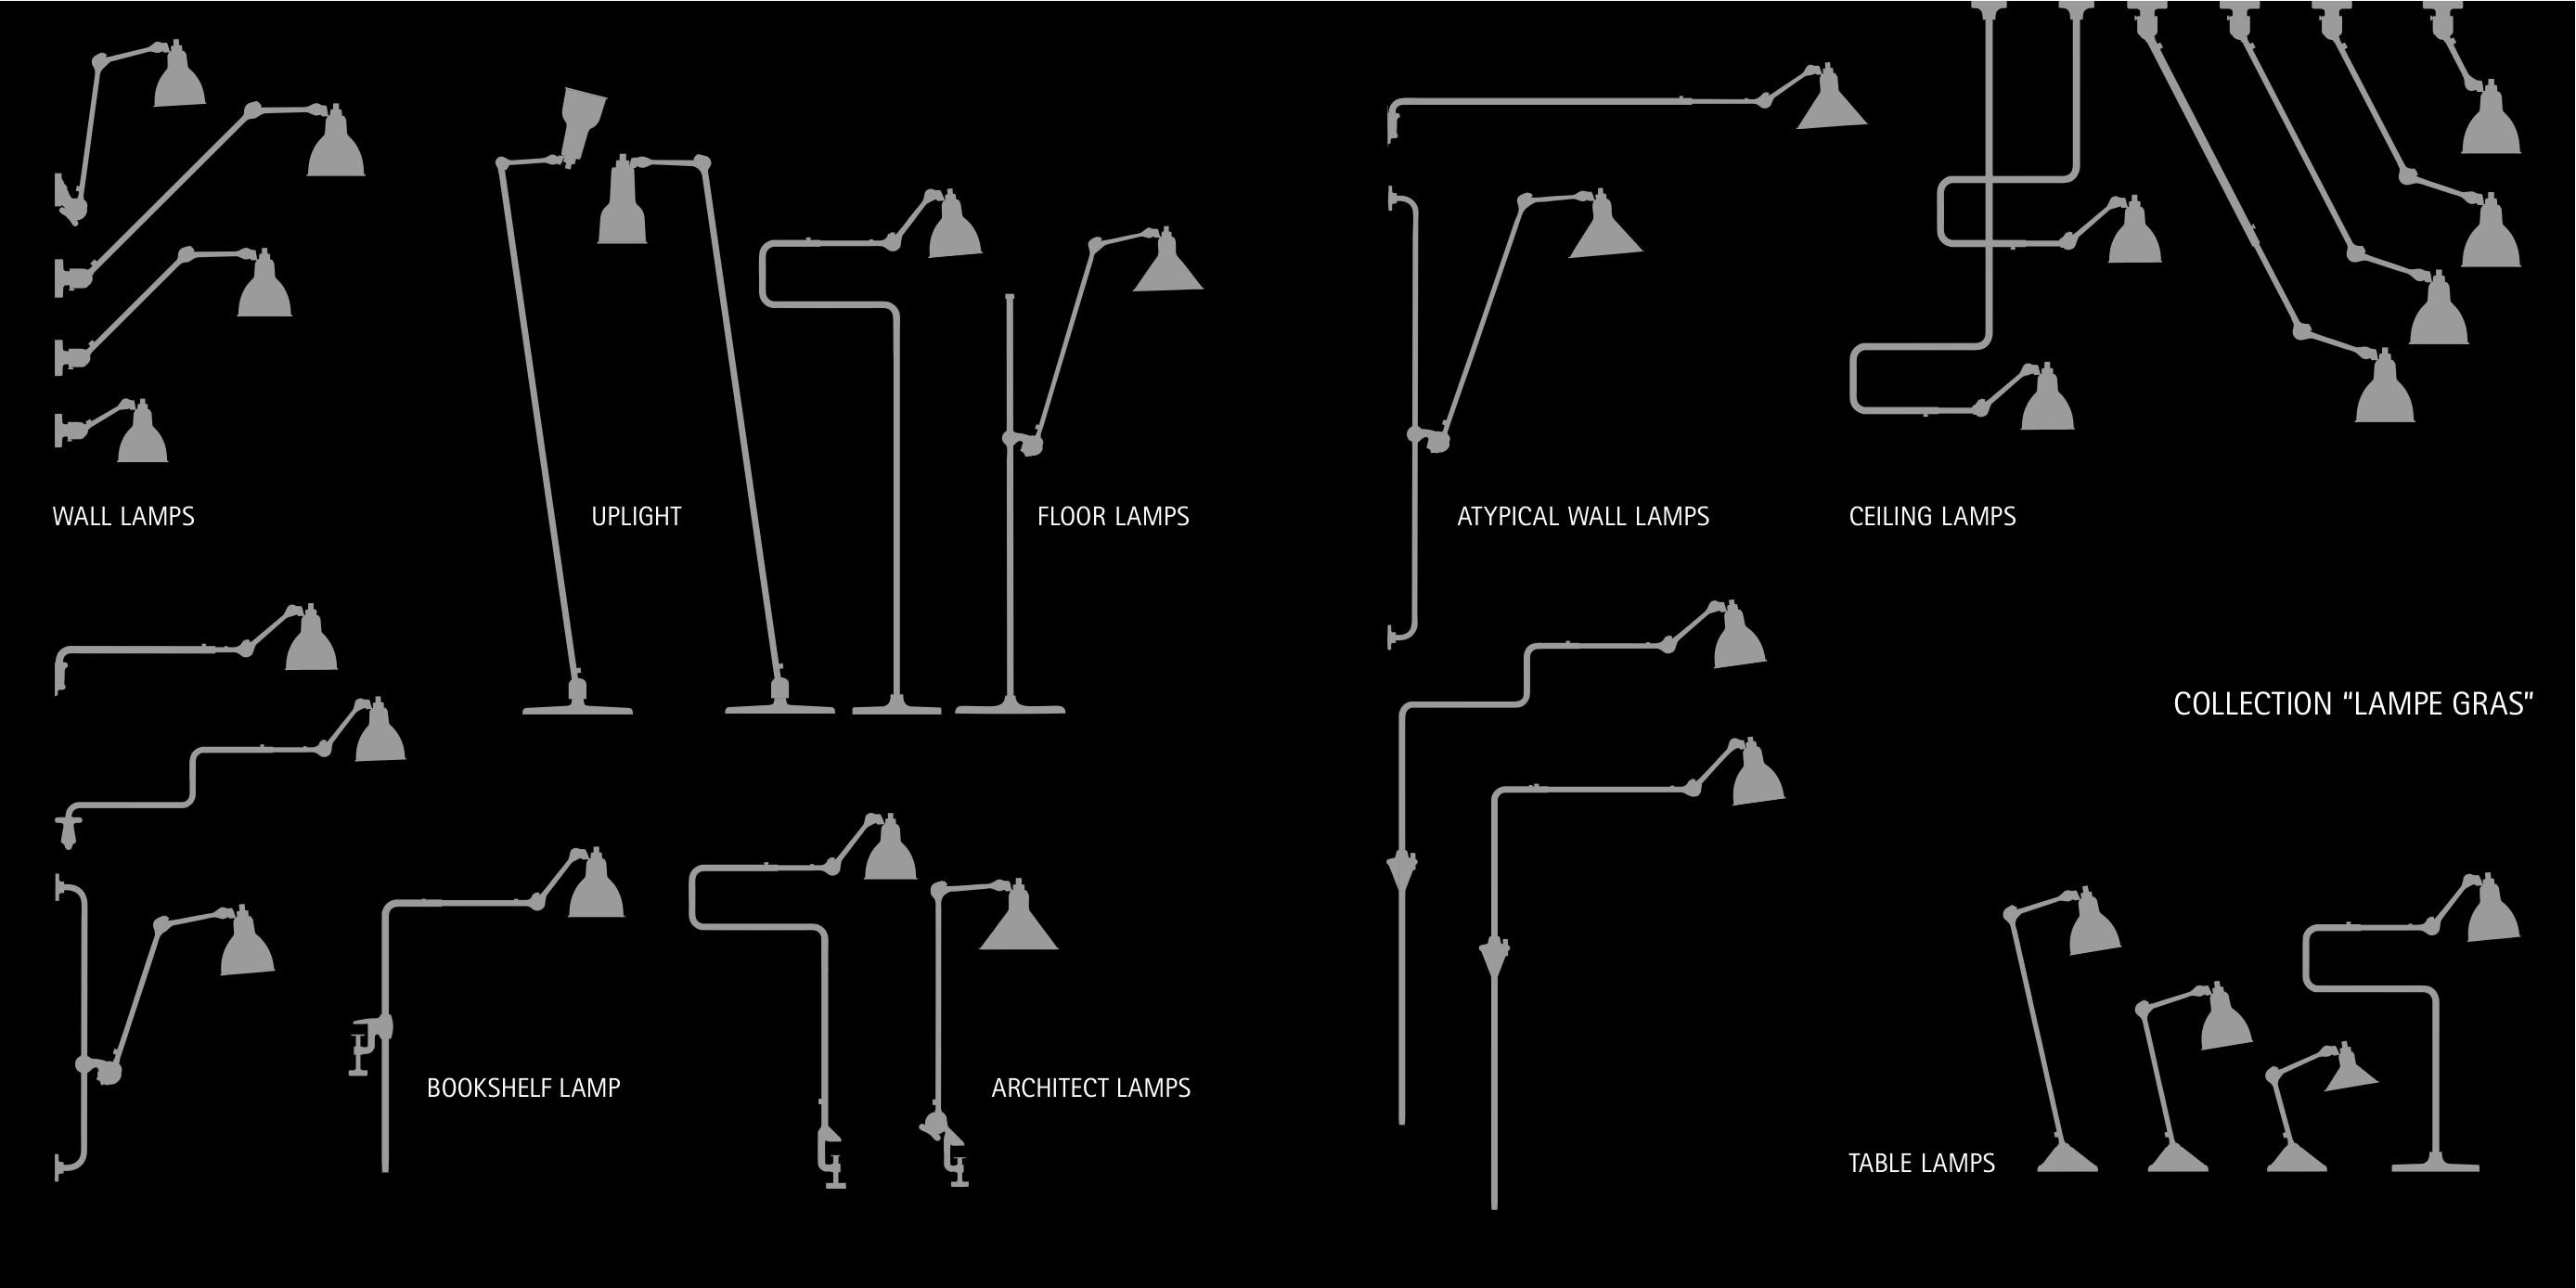 Lampe Gras - DCW - Bernard-Albin Gras